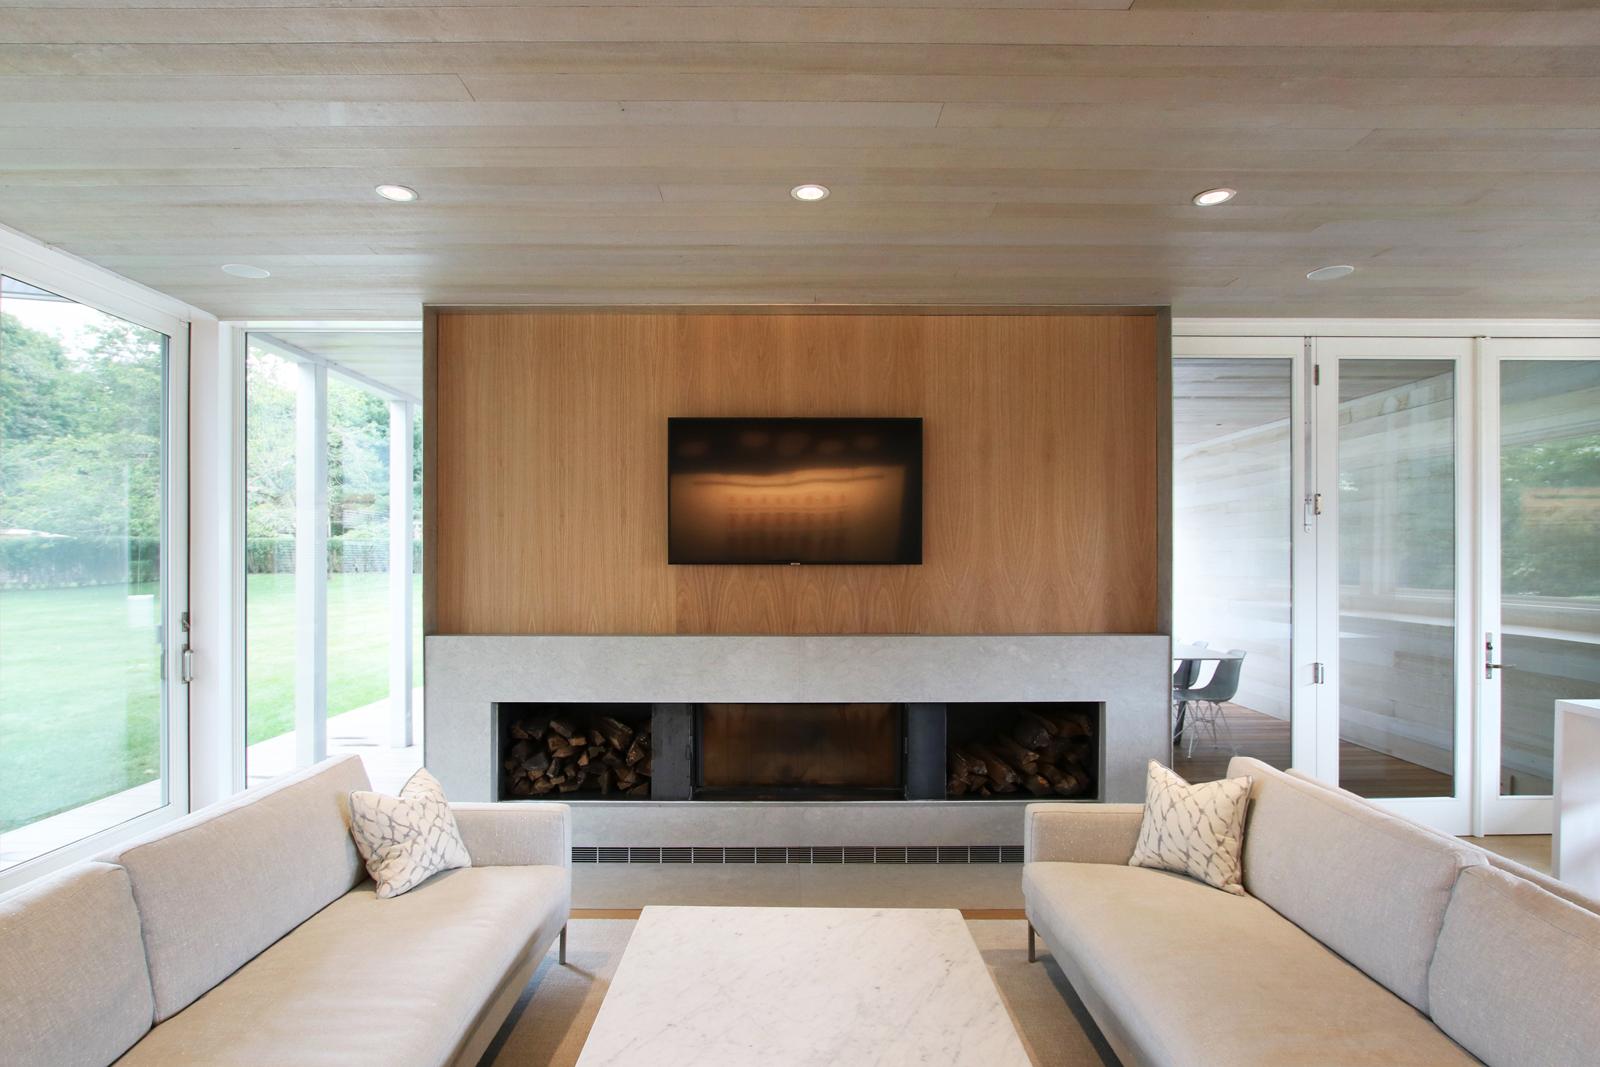 10-re4a-resolution-4-architecture-modern-modular-prefab-bridgehampton house-interior-living.jpg